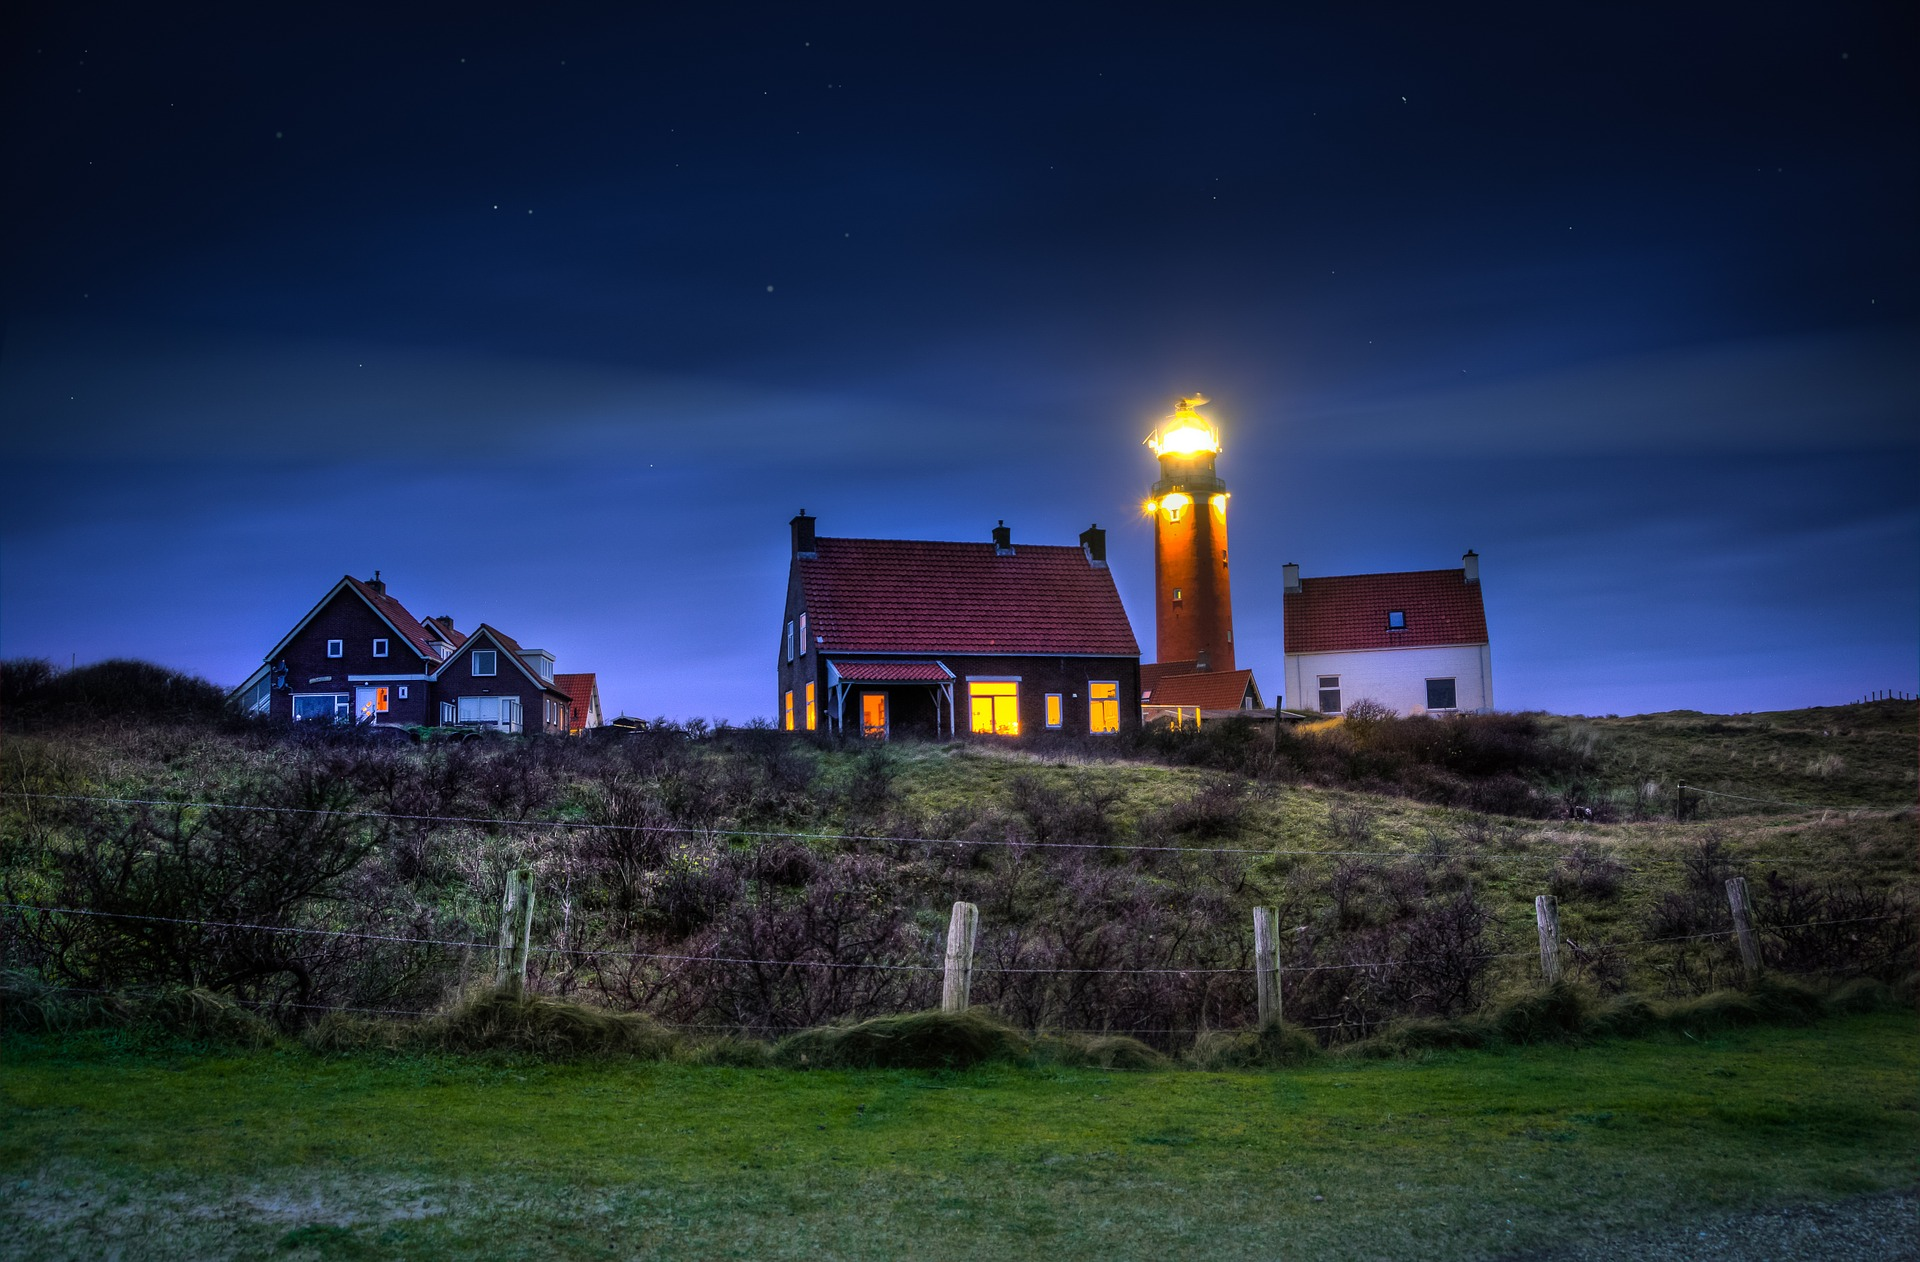 lighthouse-1111176_1920.jpg